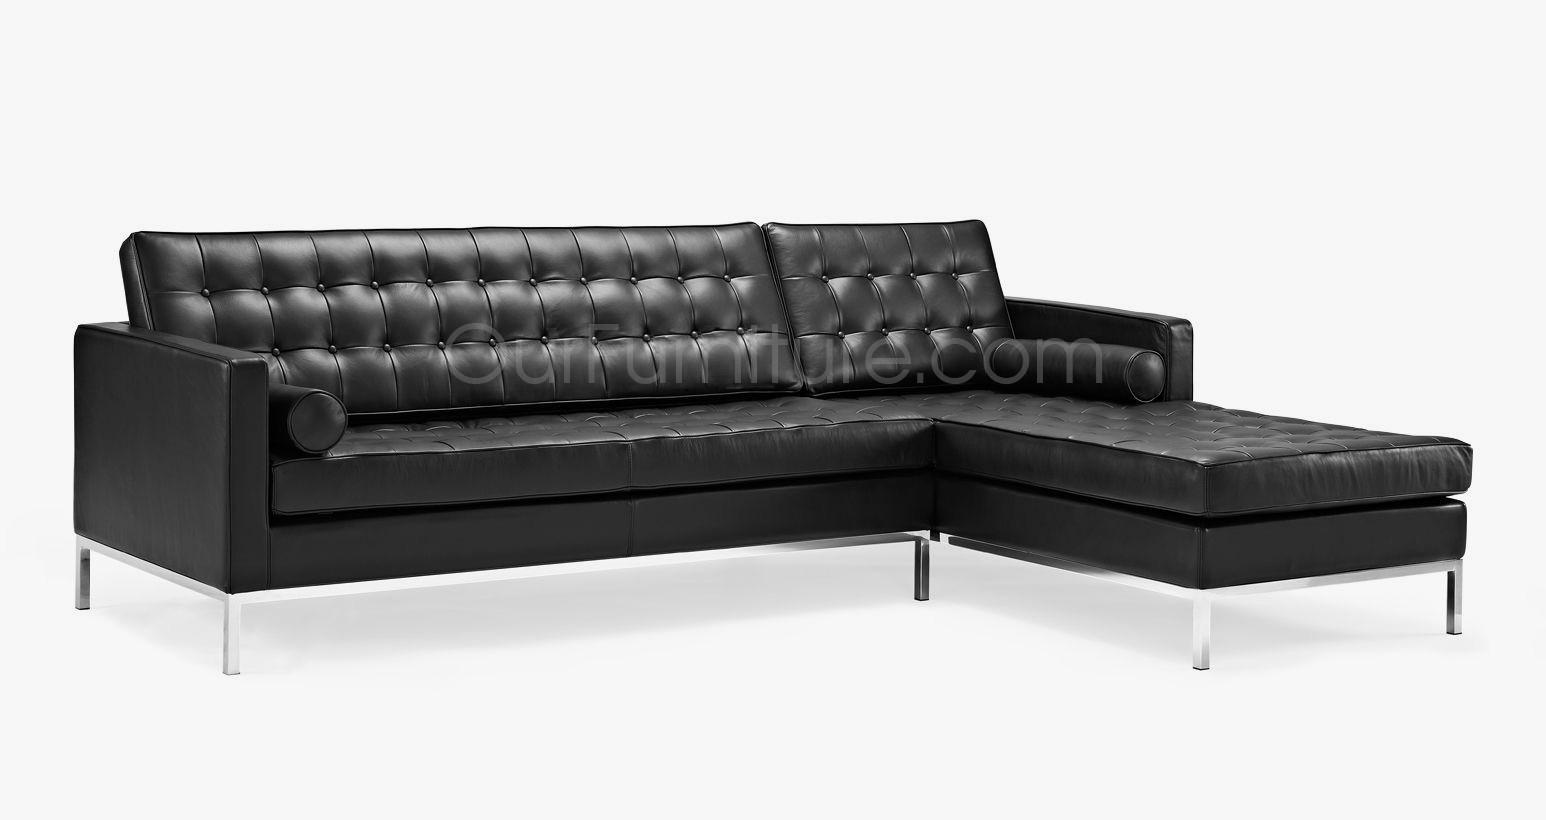 Florence Knoll Style Corner Sofa Pertaining To Florence Knoll Style Sofas (Image 8 of 15)